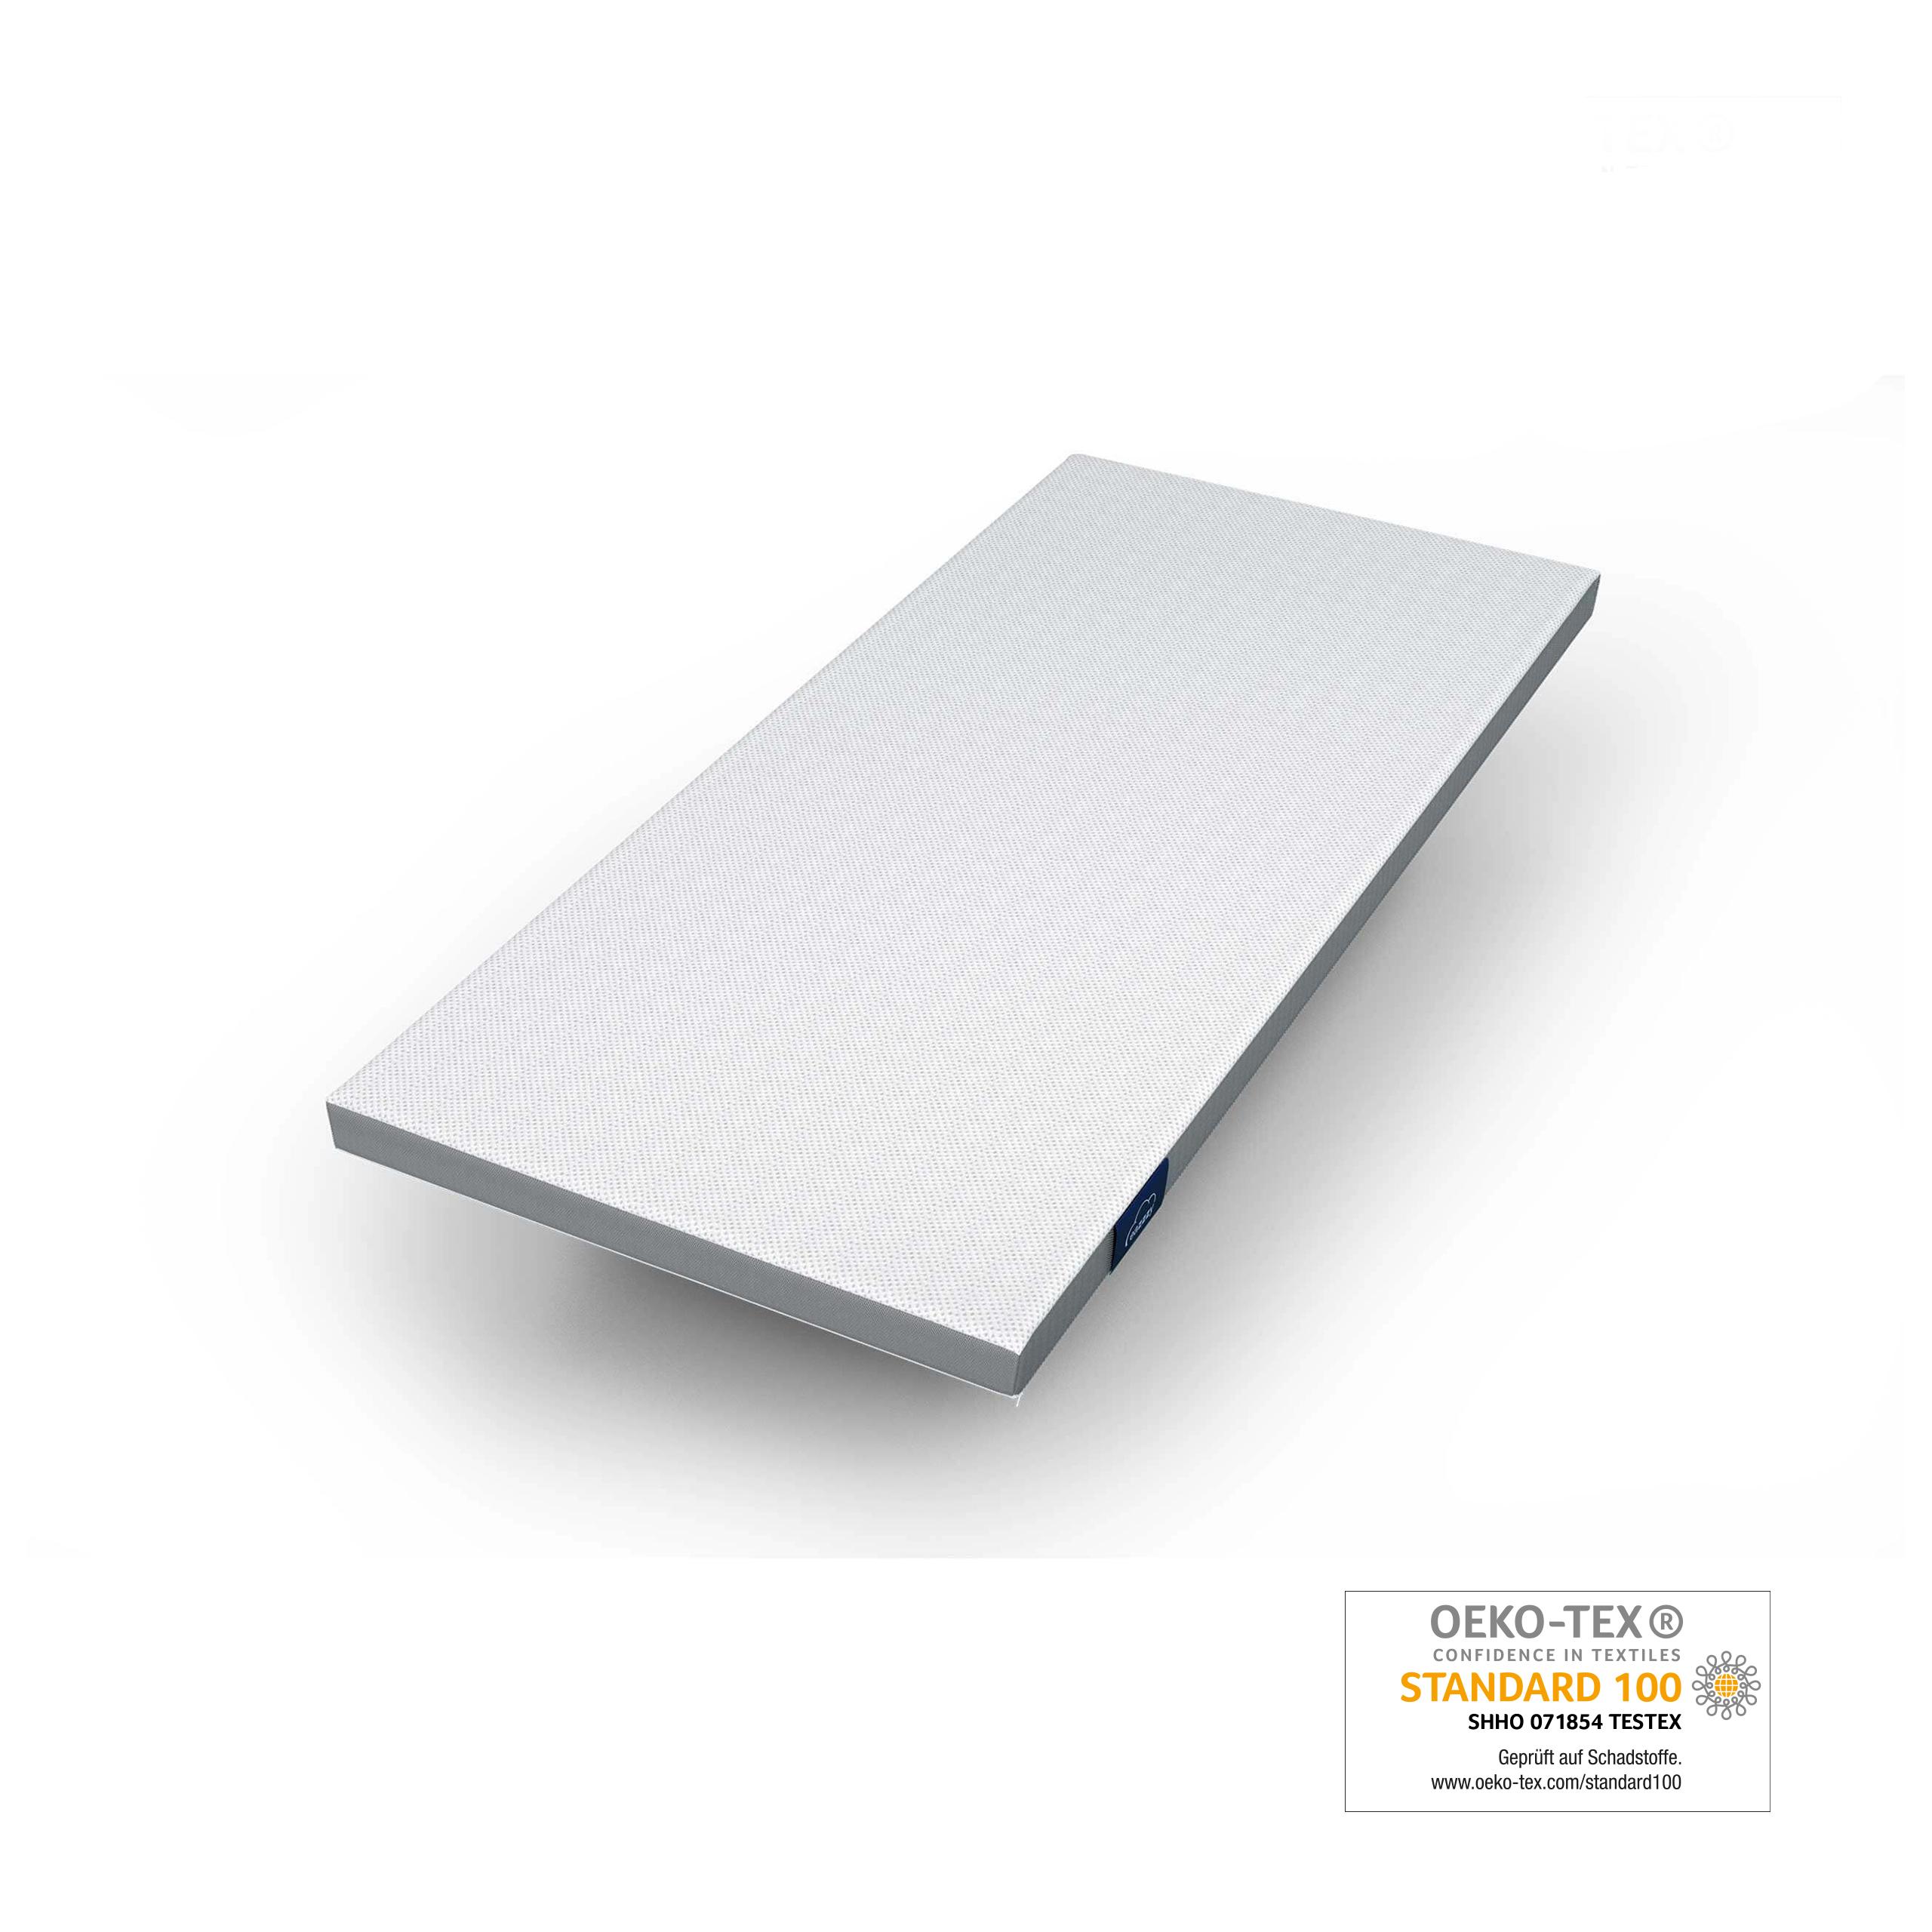 Genius eazzzy | Matratzentopper 90 x 200 x 7 cm A19204